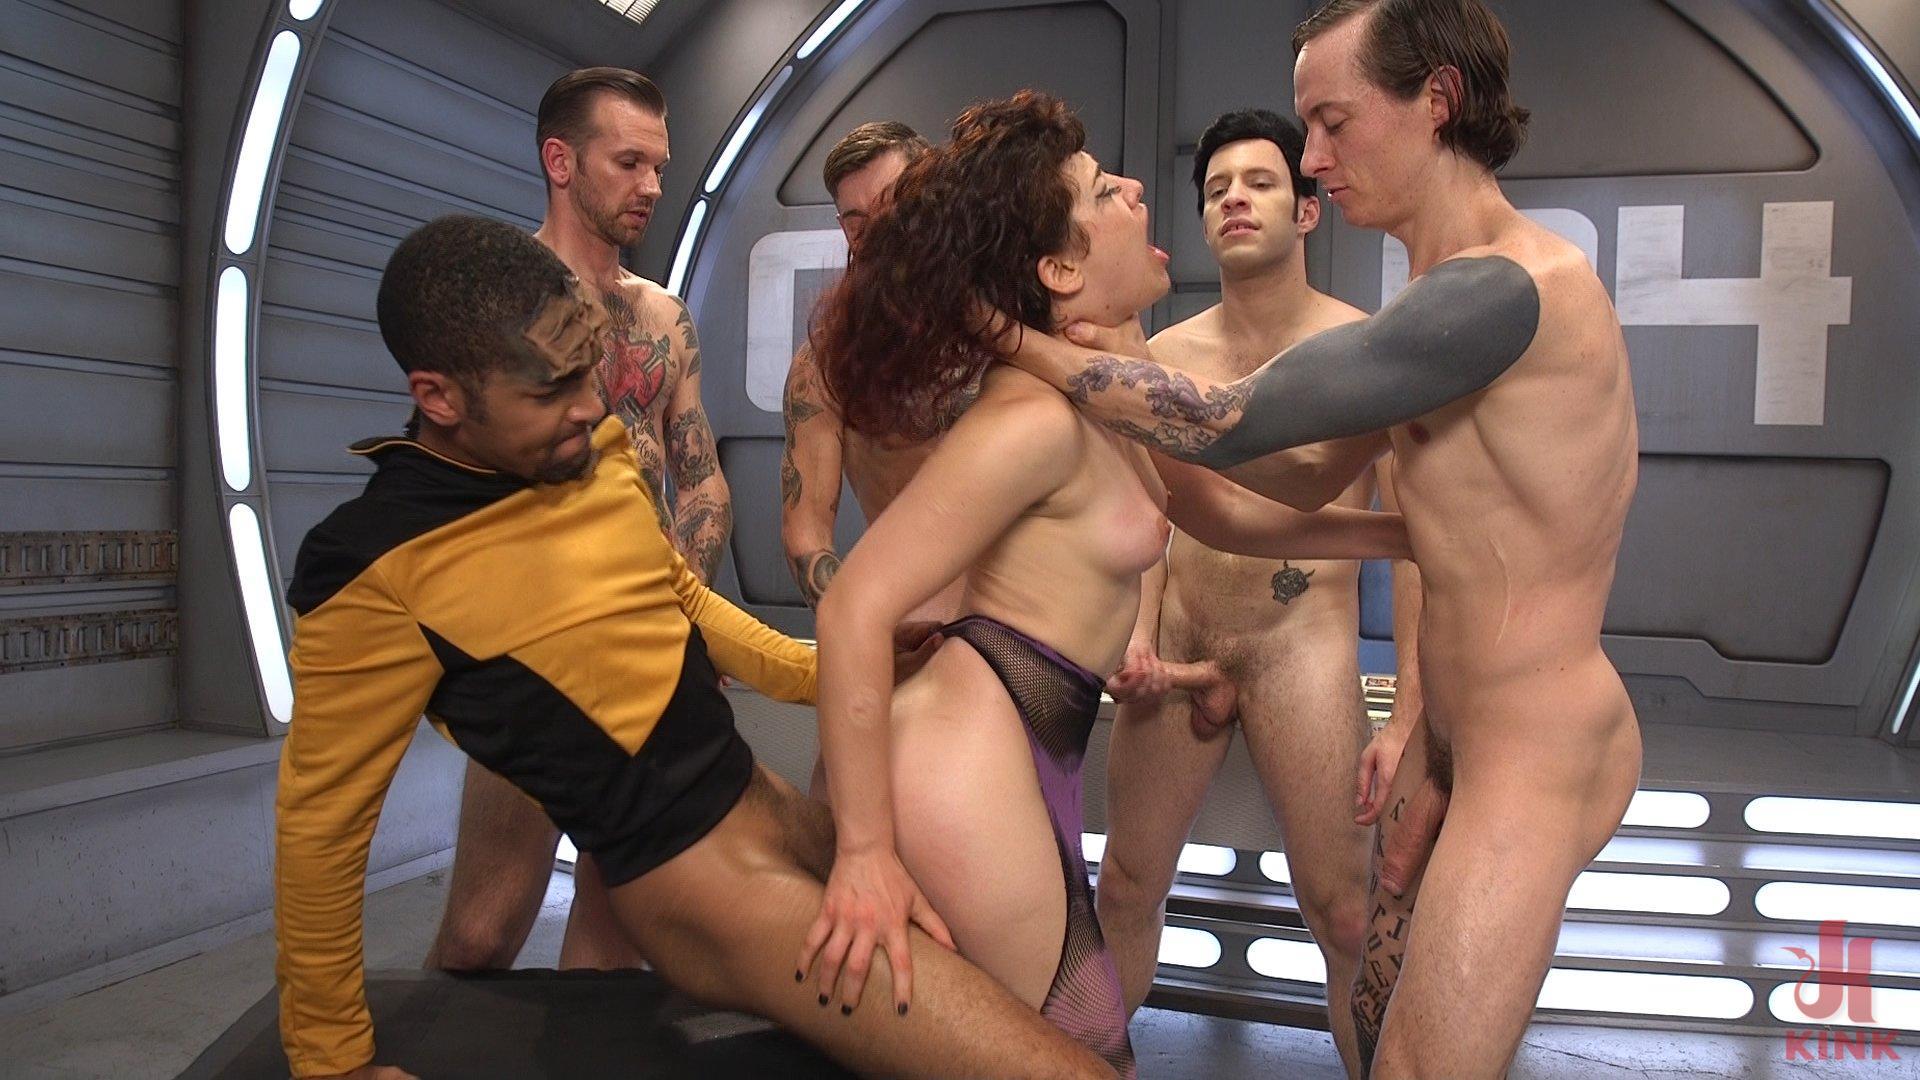 Star trek the next penetration